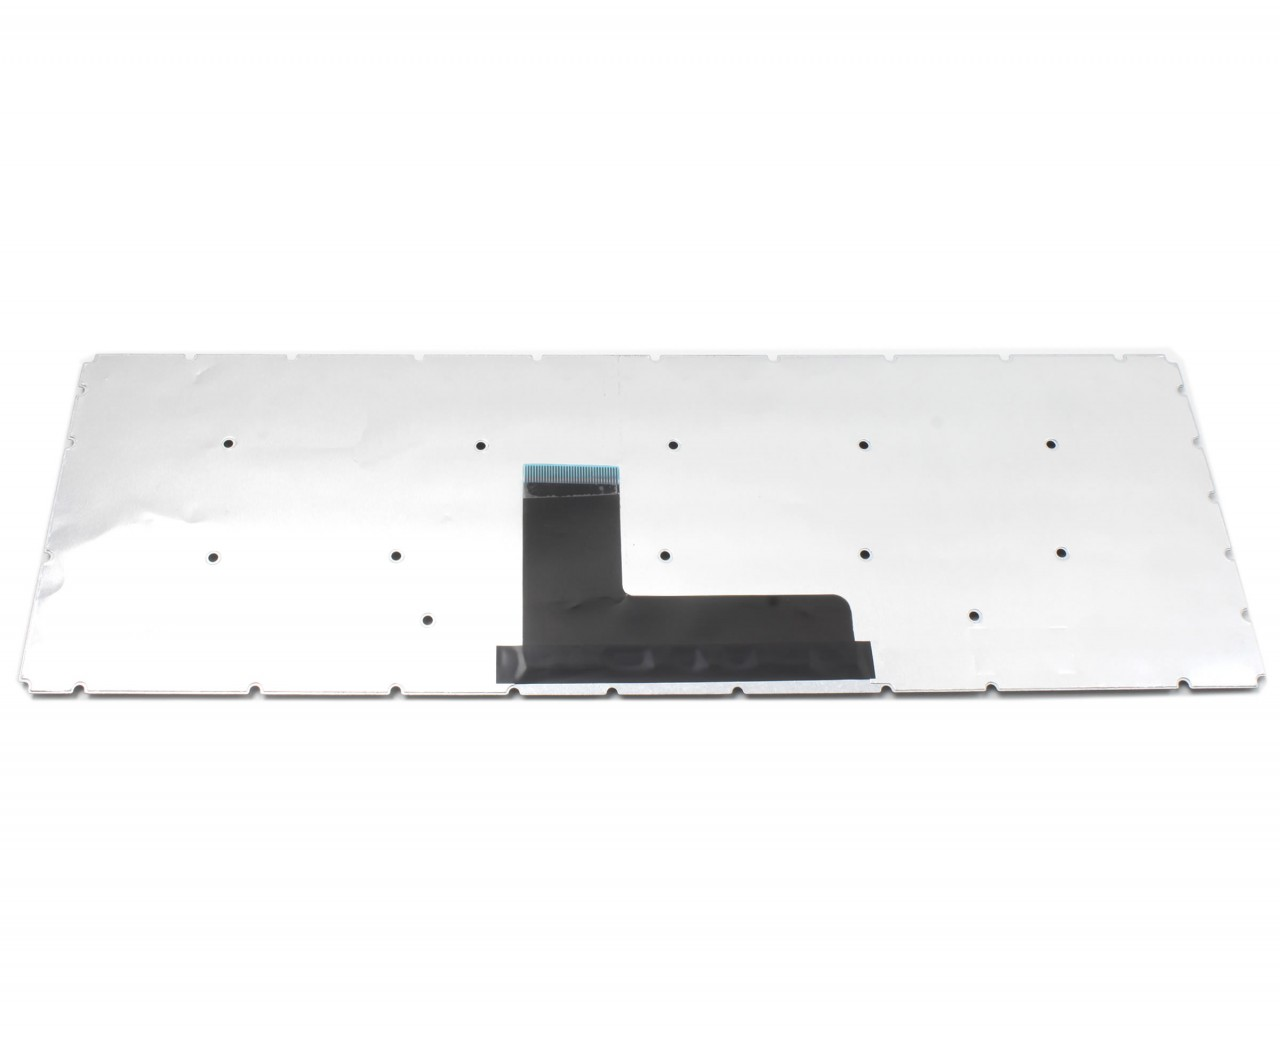 Tastatura Toshiba Satellite L50 B 1CD layout US fara rama enter mic imagine powerlaptop.ro 2021